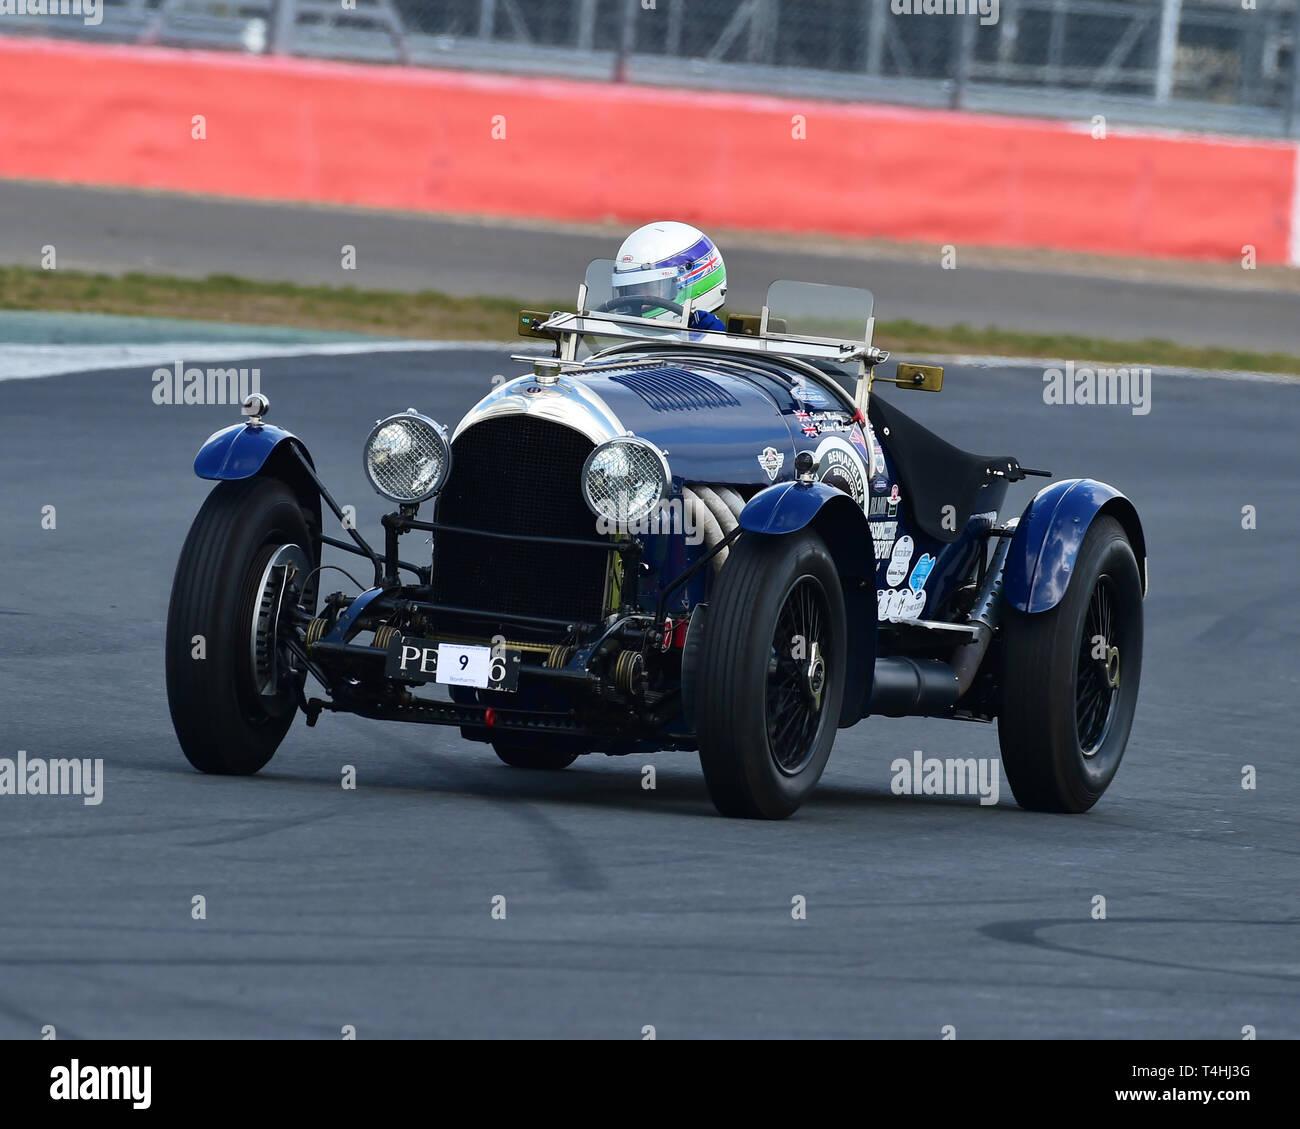 Richard Hudson, Stuart Morley, Bentley 3-4½ litre, Benjafield 100, 100 Years of Bentley, April 2019,  Silverstone, Northamptonshire, England, circuit  - Stock Image